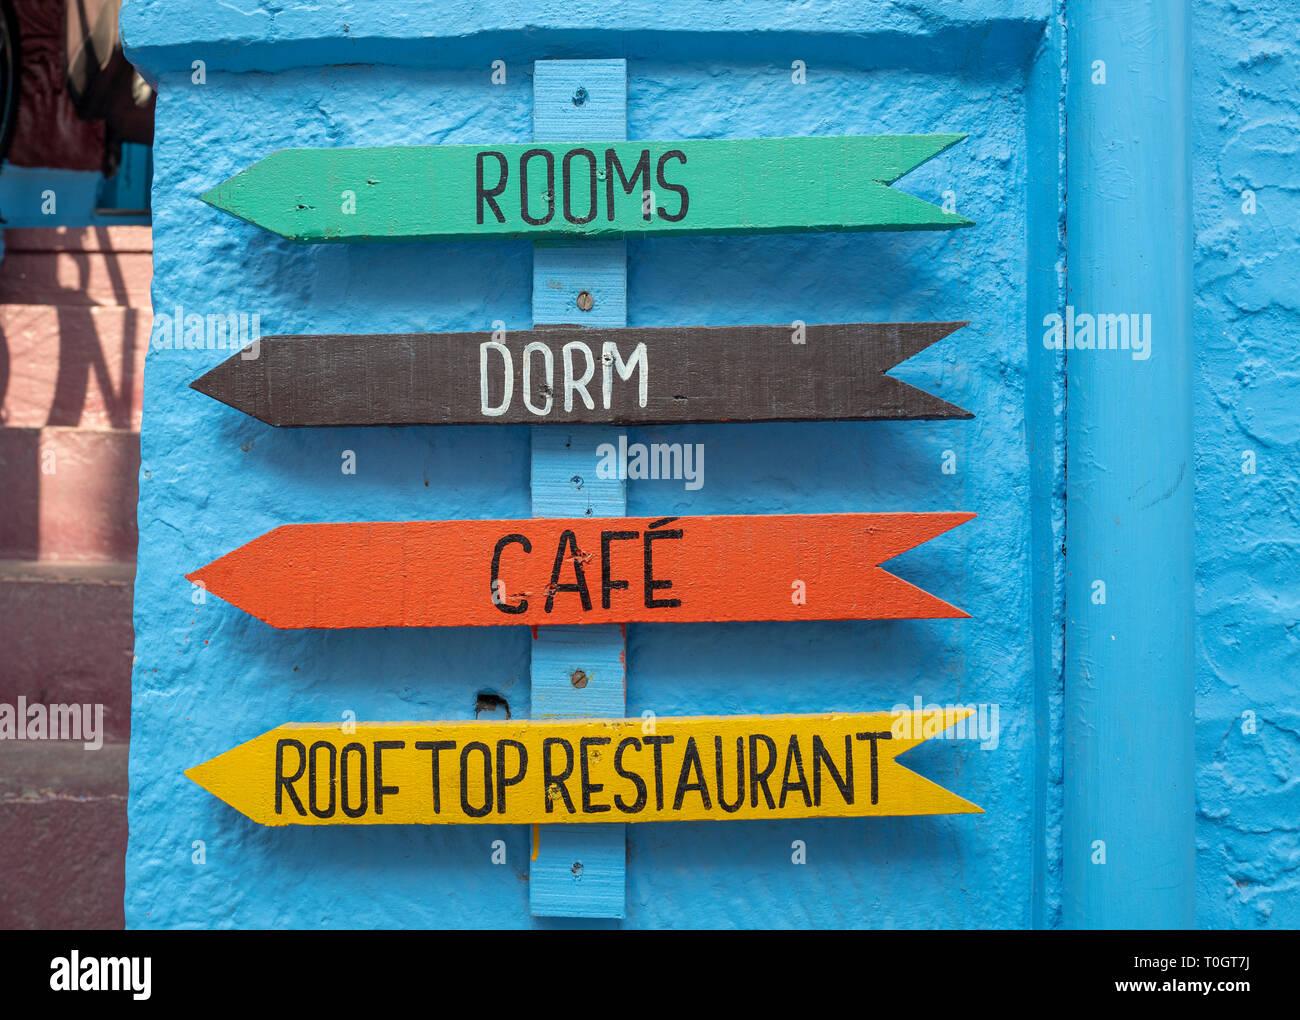 Hostel Dorm Available Rooms Signage in Jodhpur, India Stock Photo